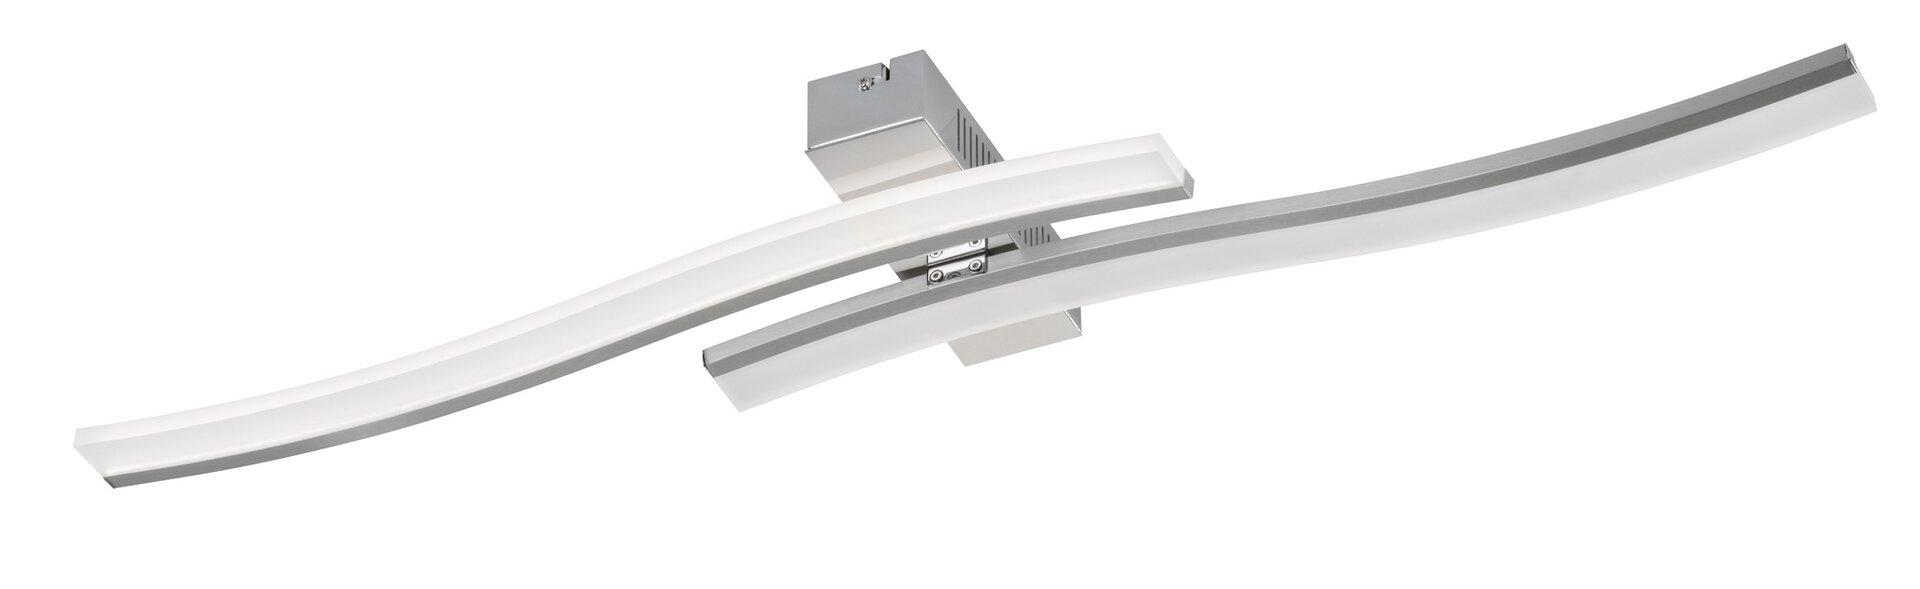 Deckenleuchte Beam Fischer-Honsel Metall 20 x 7 x 87 cm